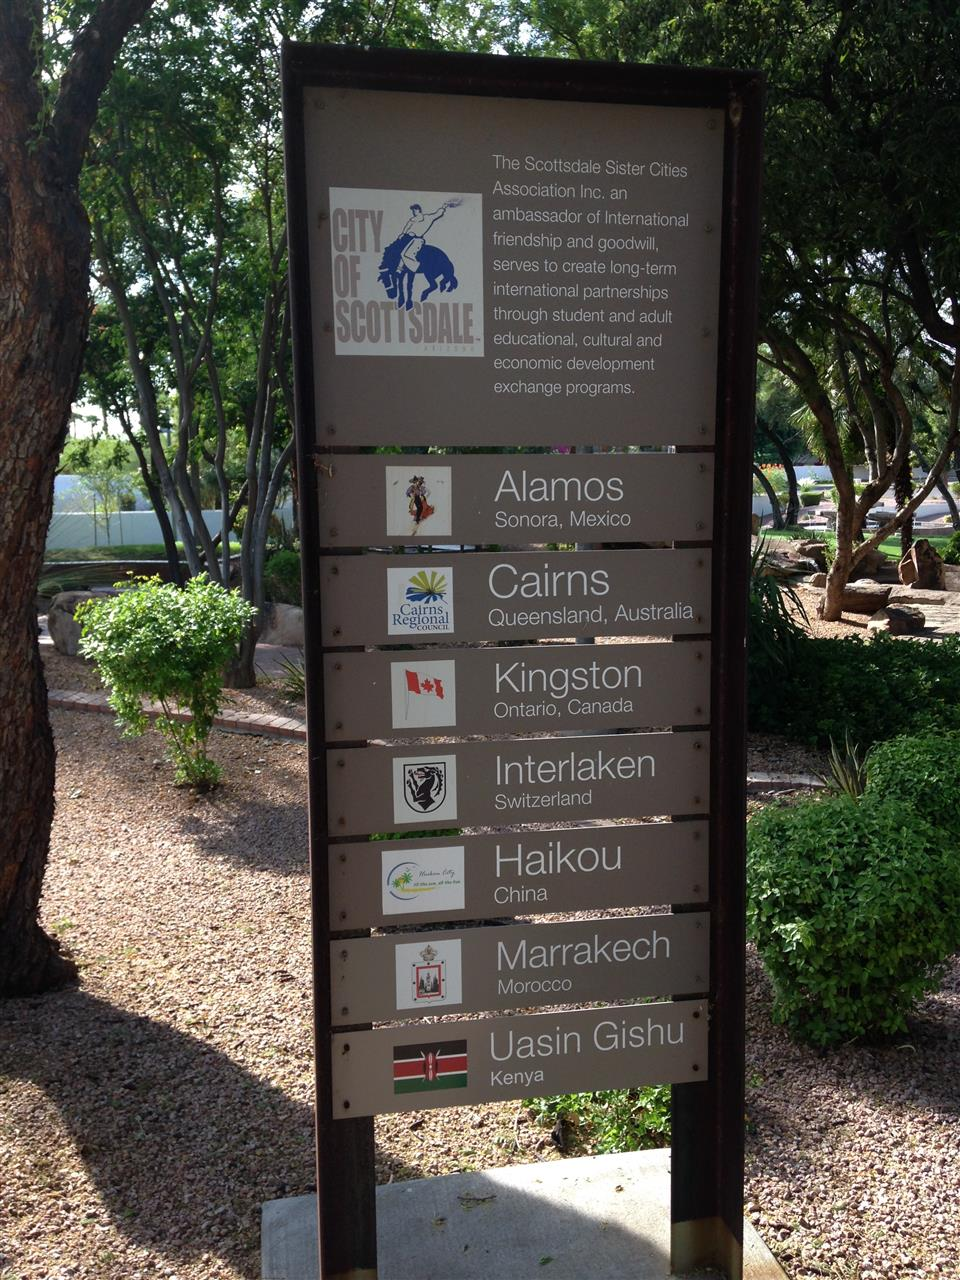 We're local, we're global in Scottsdale, Arizona.